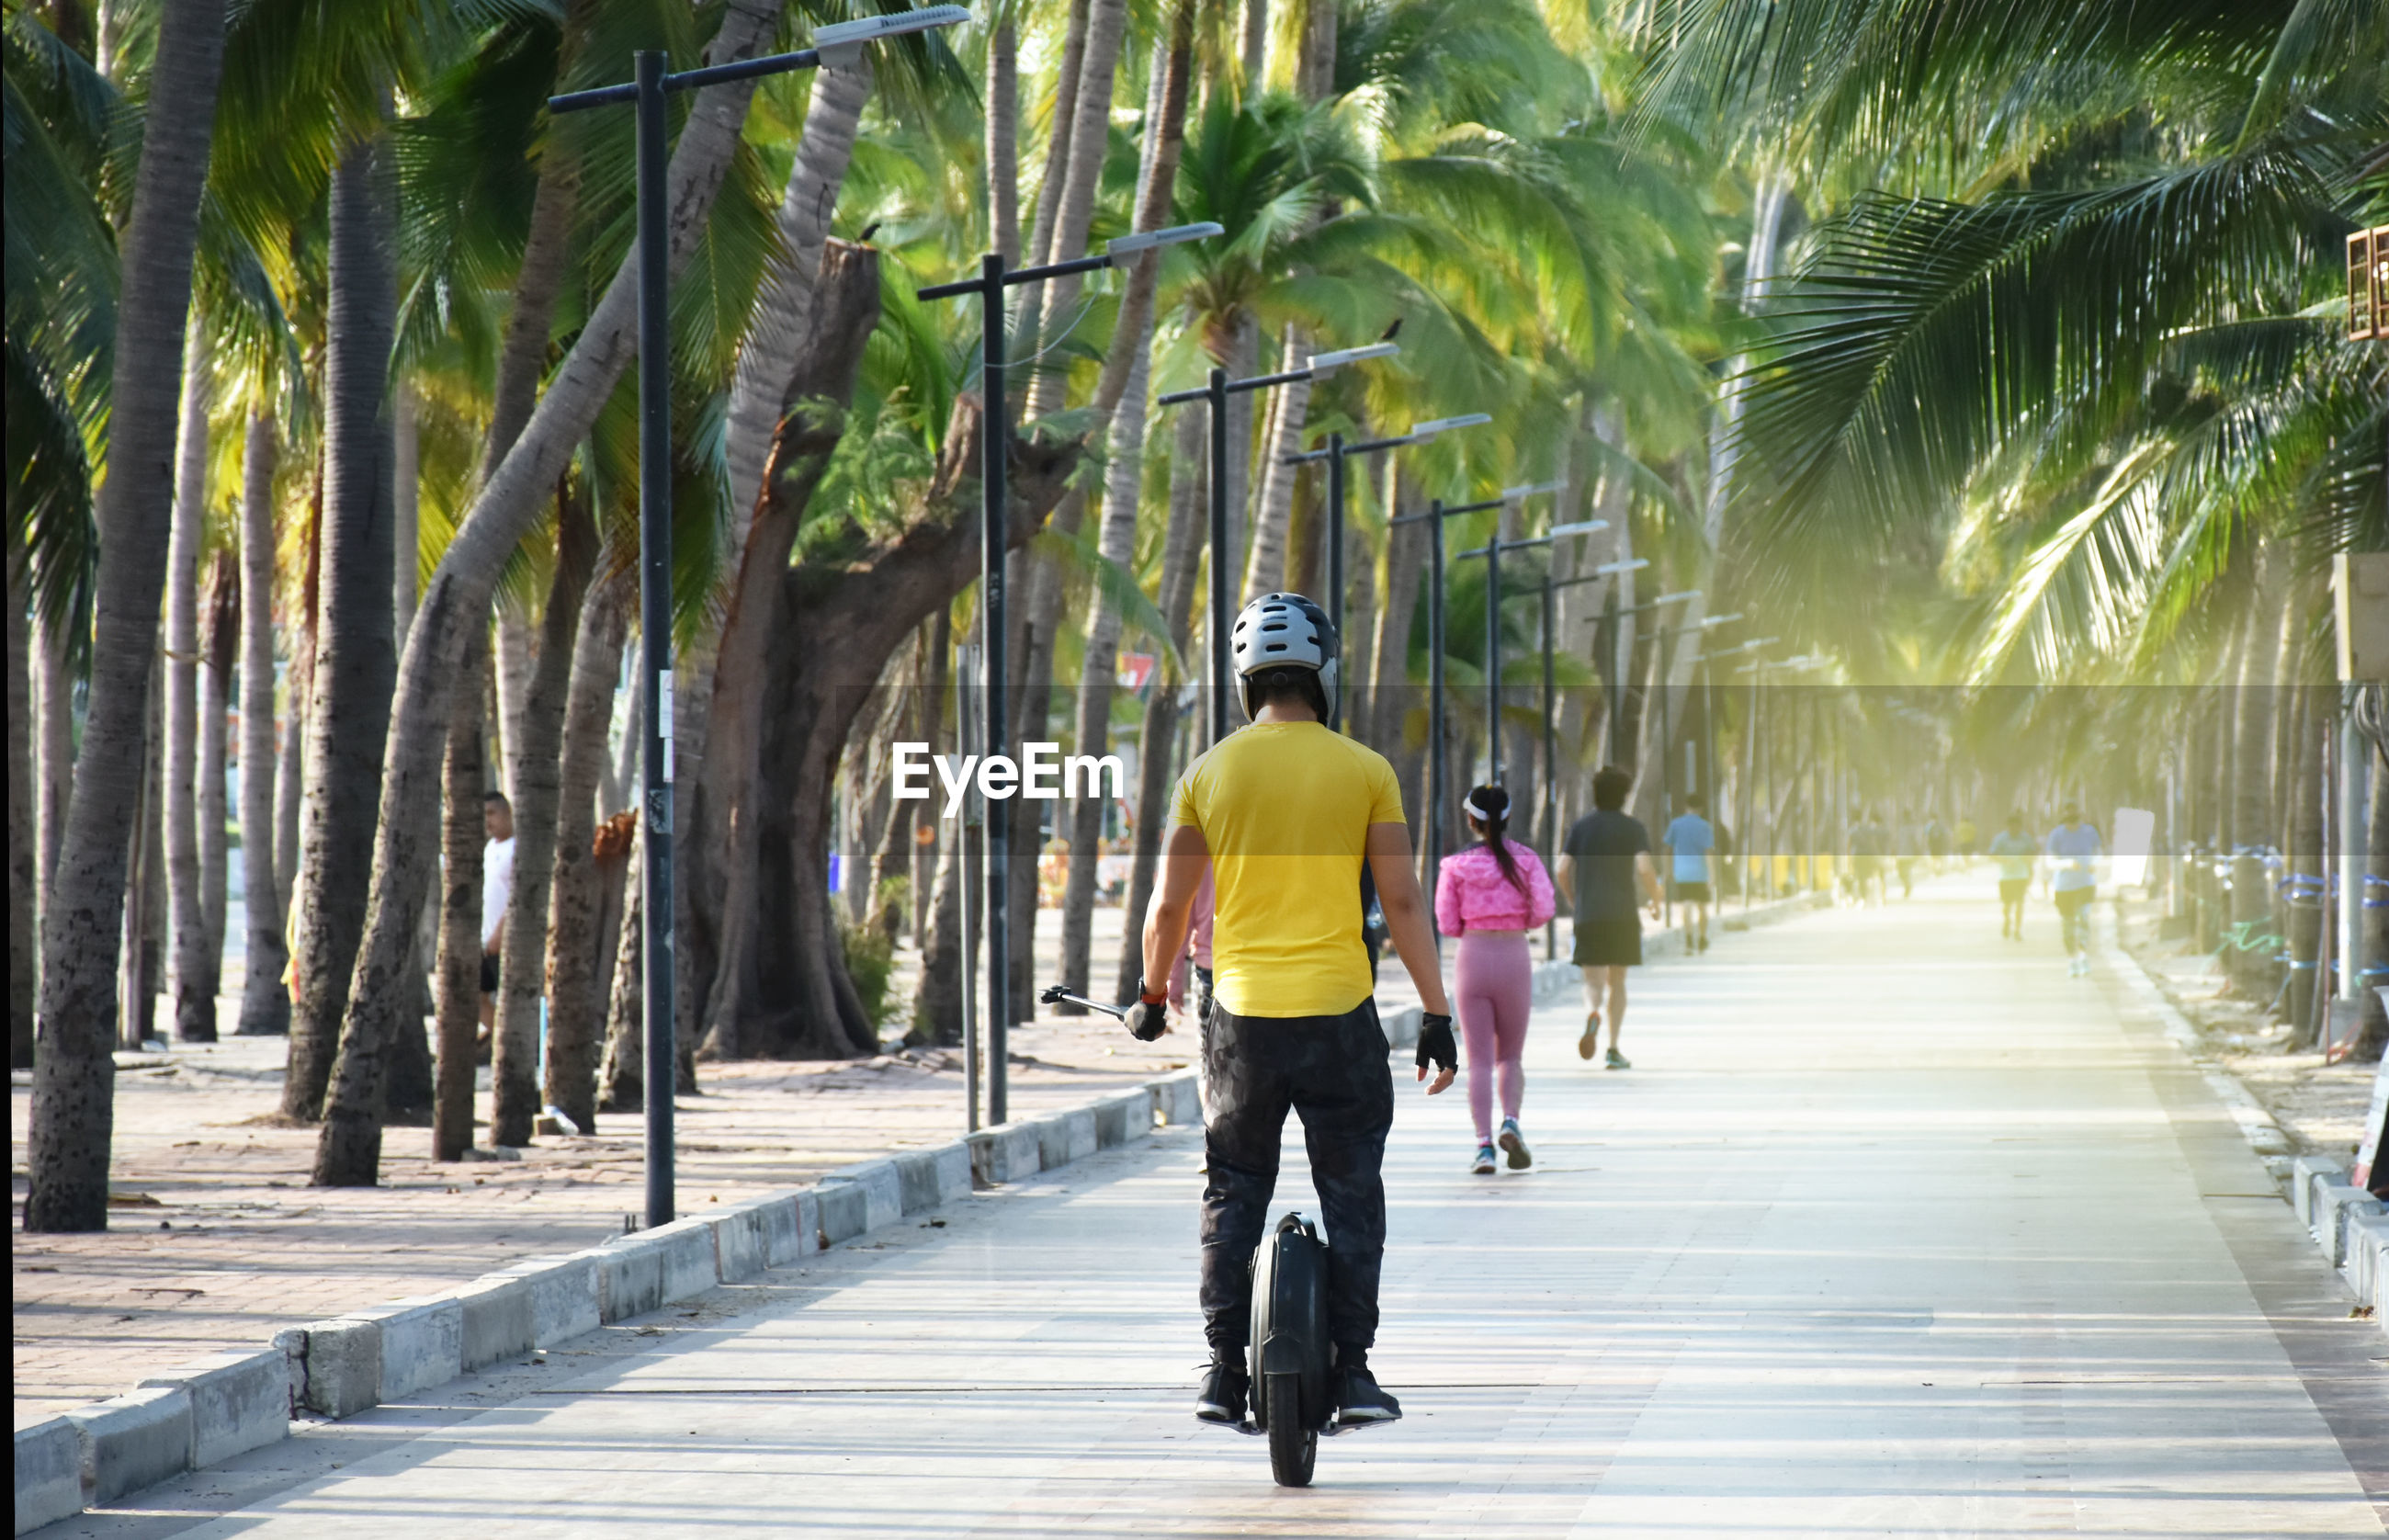 FULL LENGTH REAR VIEW OF MAN WALKING ON FOOTPATH IN PARK